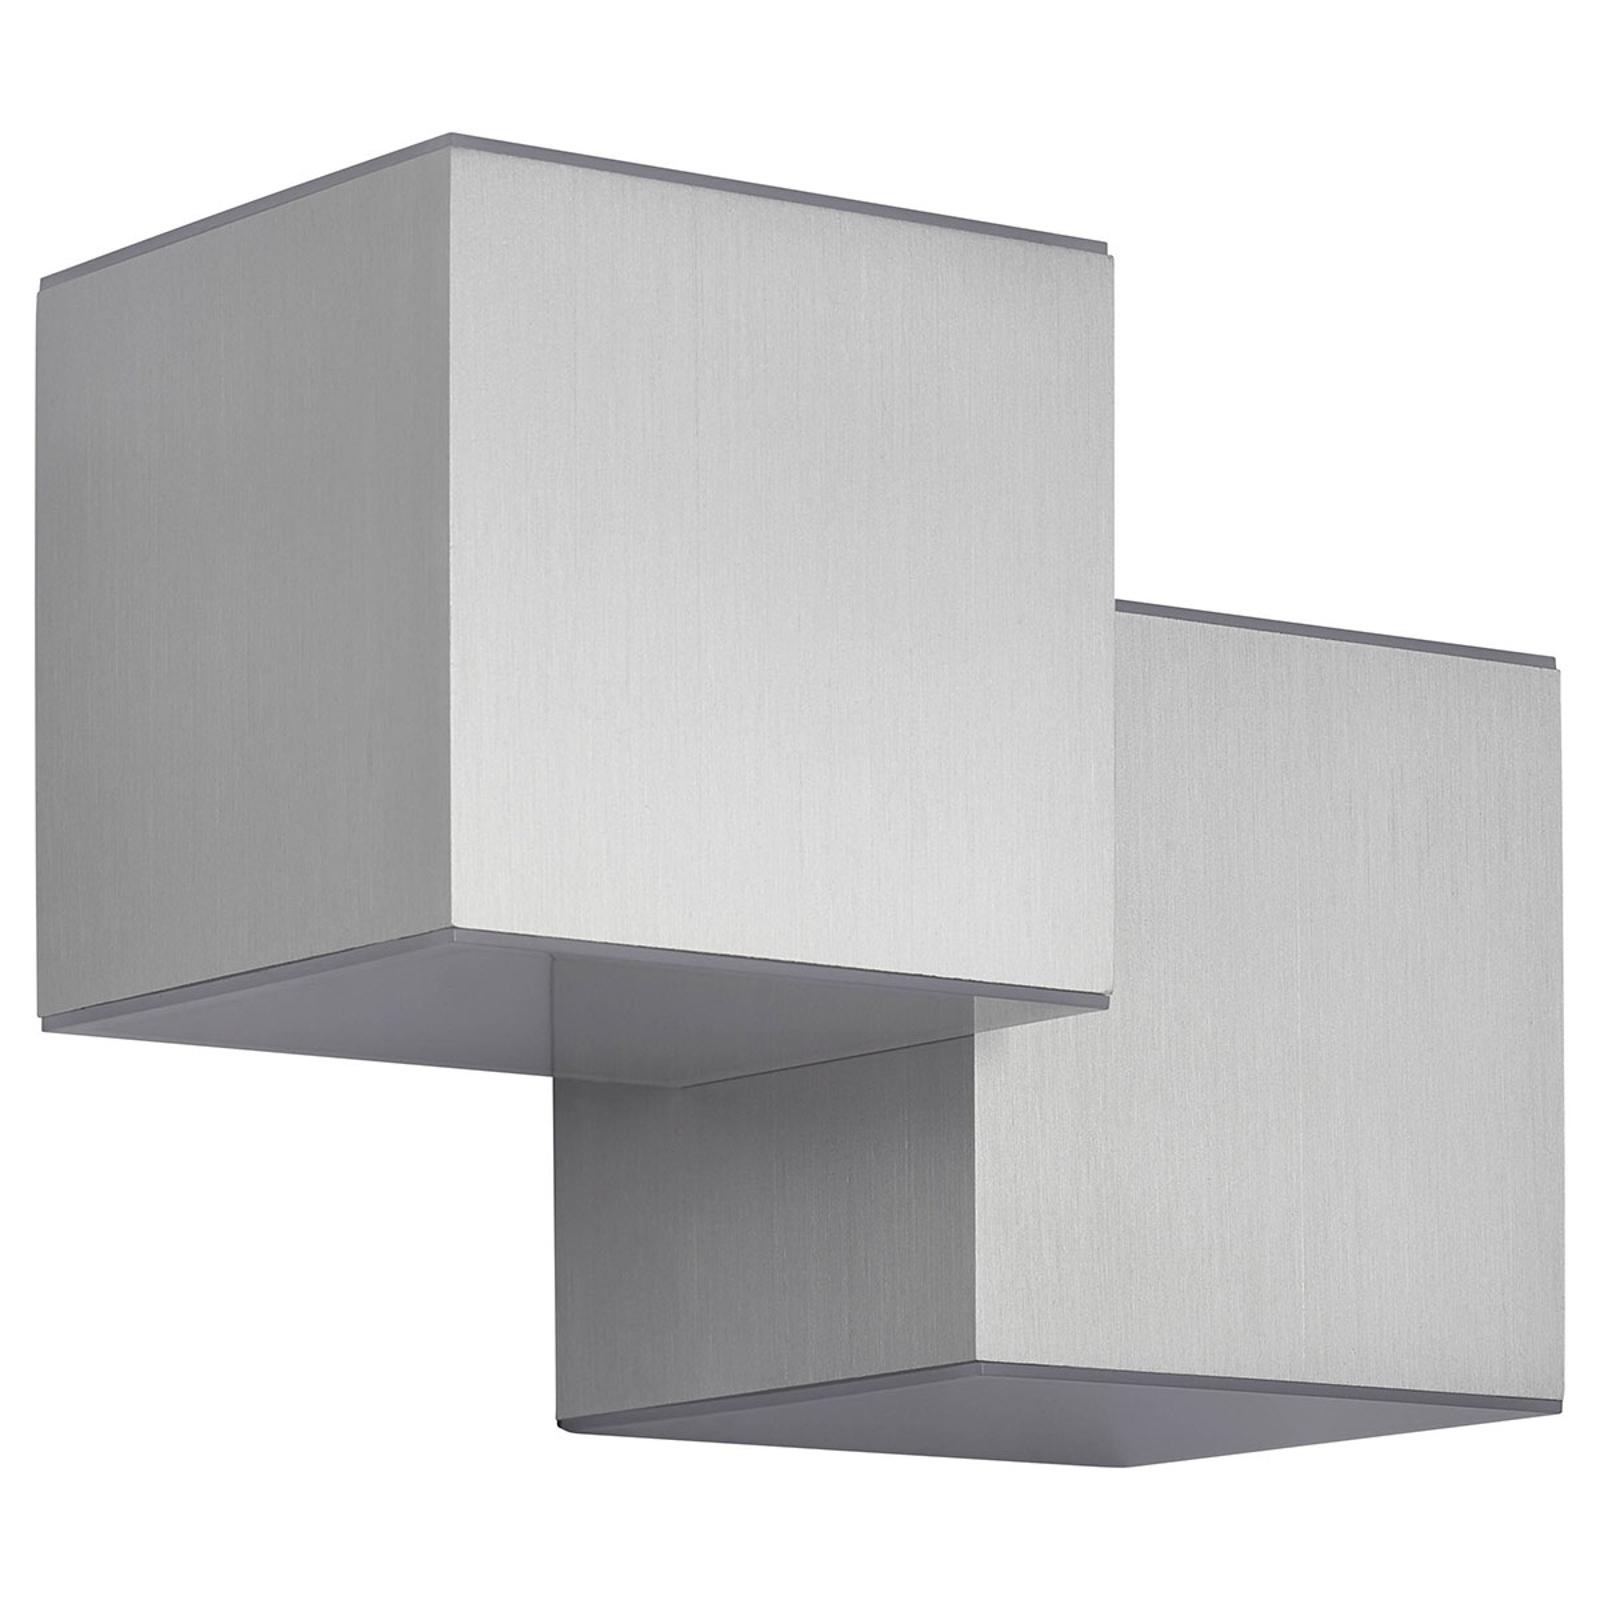 AEG Gillan LED-Wandleuchte, 4-flammig